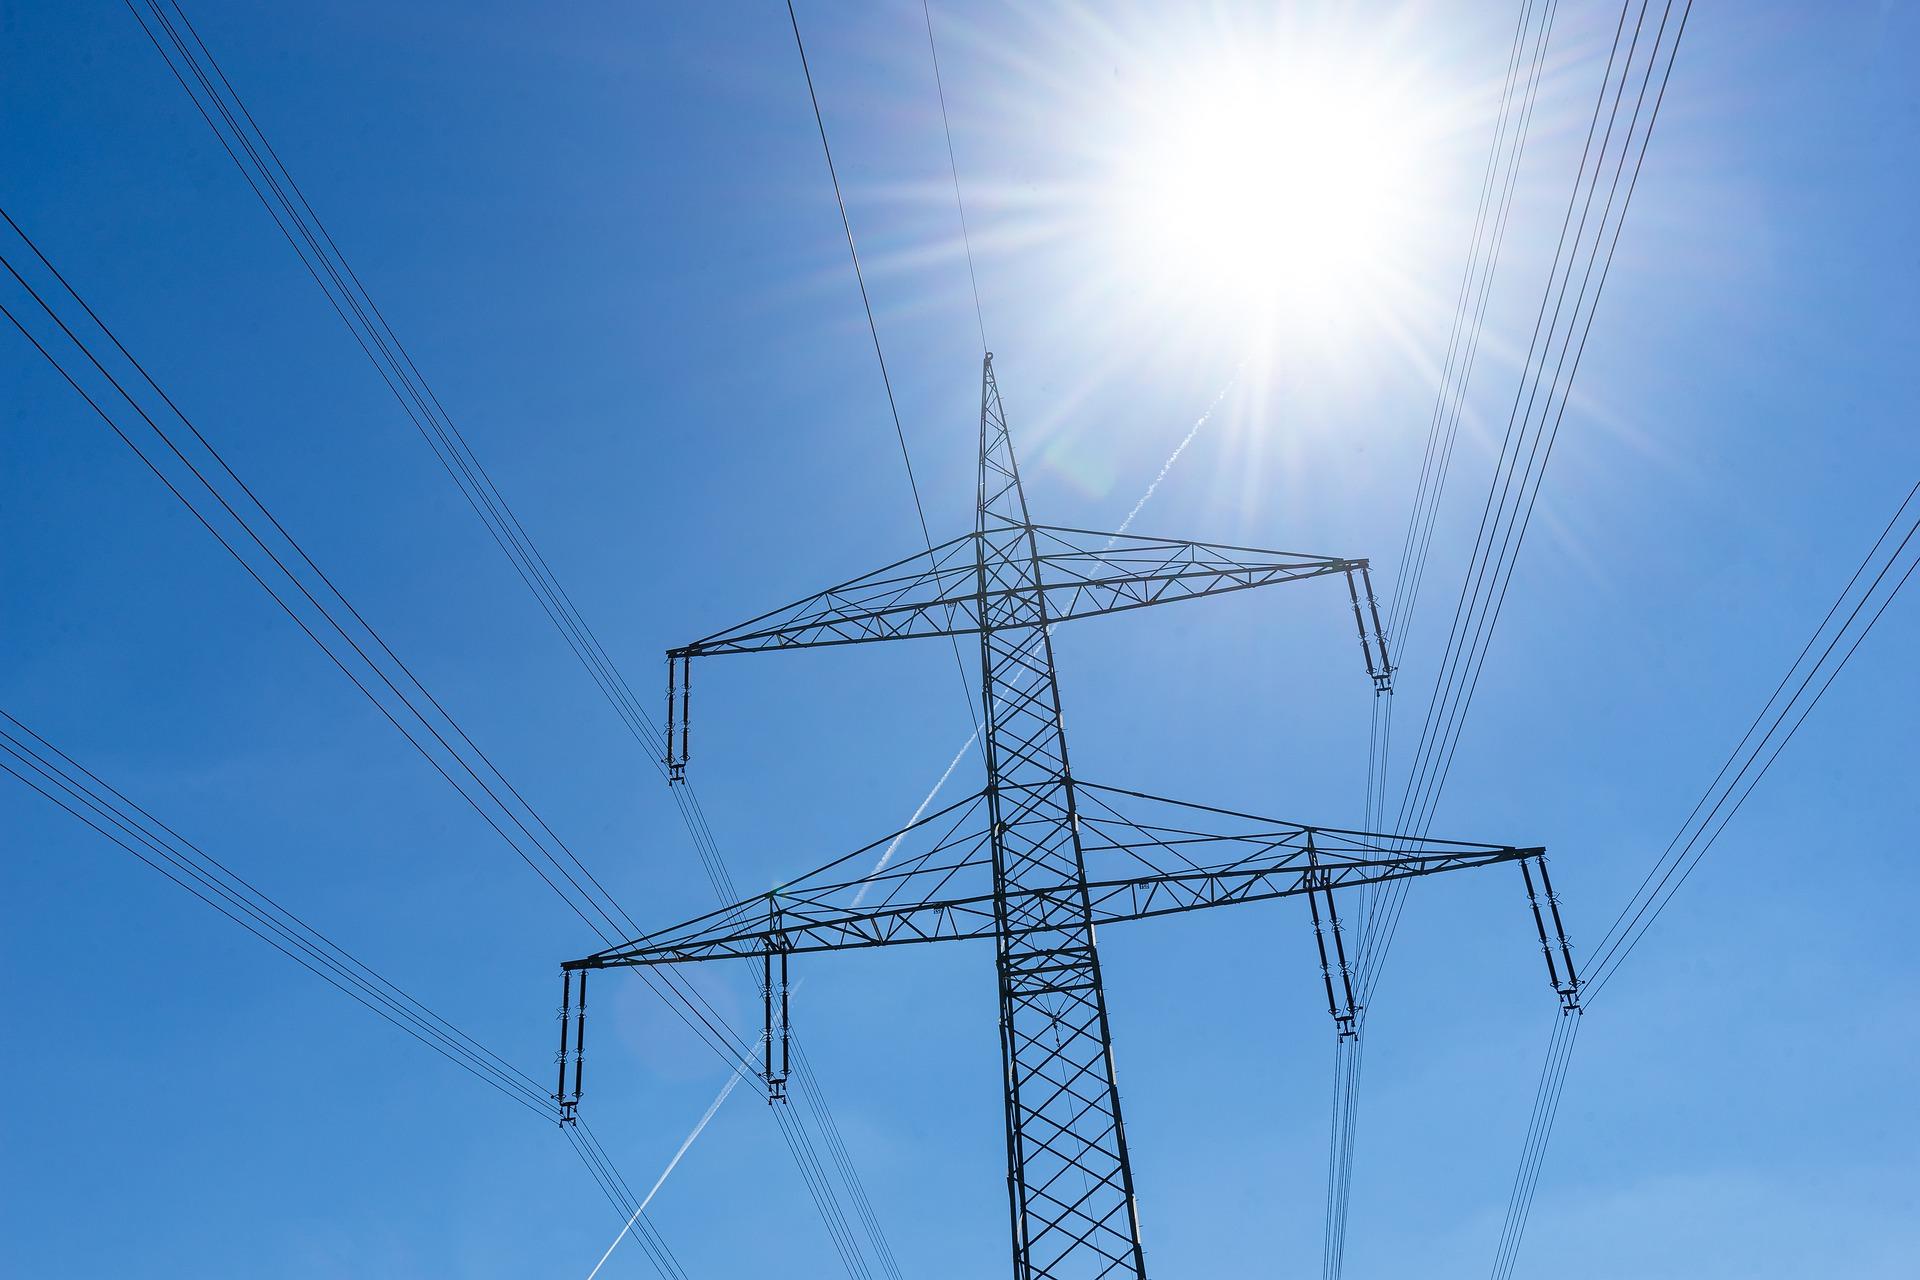 Utility Company Power Lines